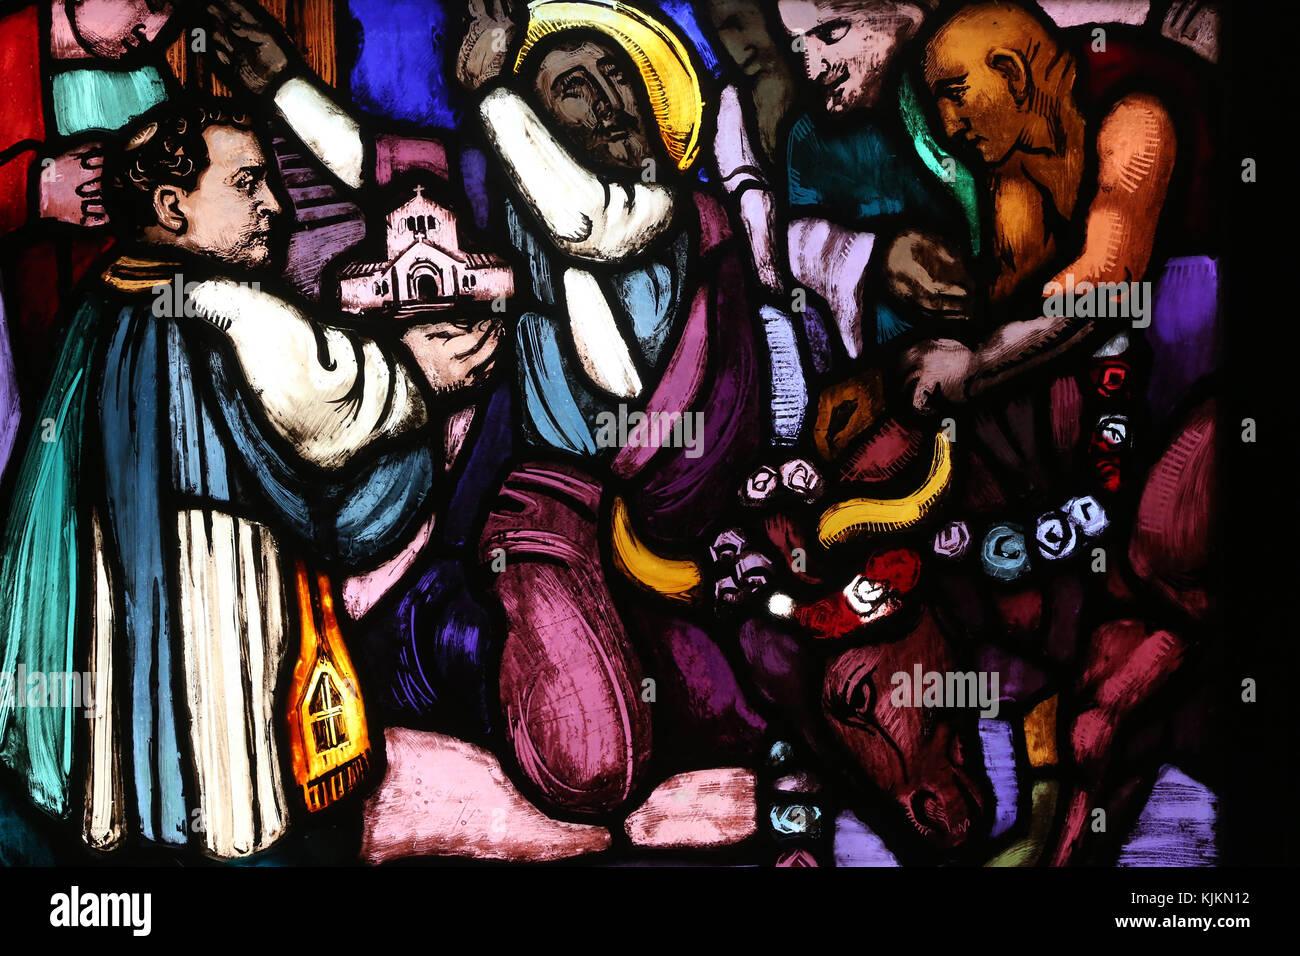 Saint Paul church.  Stained glass window.  Paul the apostle. Conversion on the way to Damascus.  Geneva. Switzerland. - Stock Image